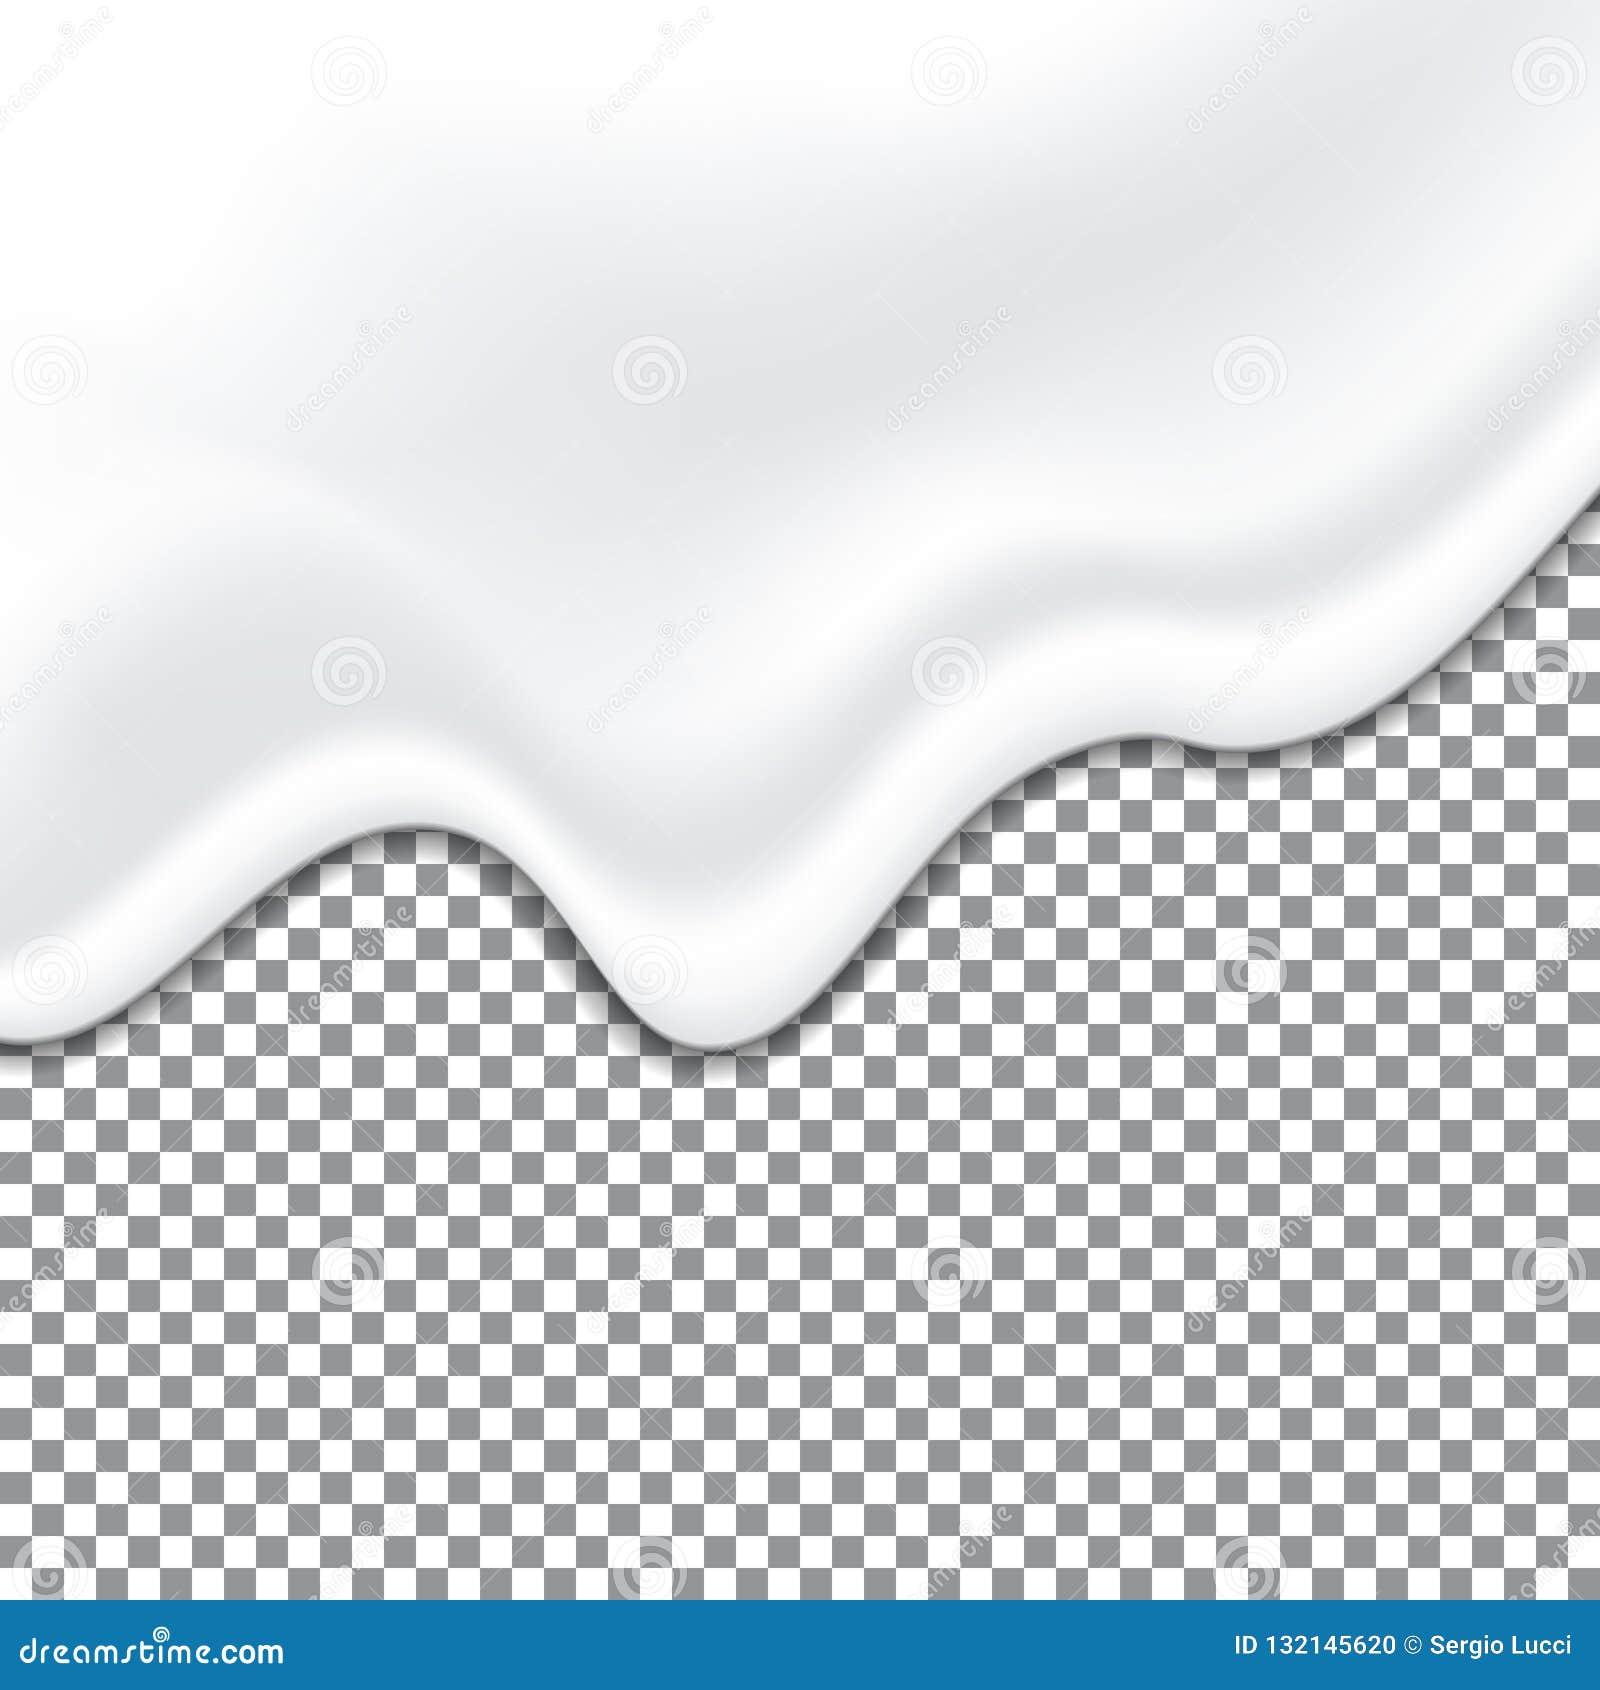 Realistic yogurt white texture. Mayonnaise sauce. Liquid creamy texture on transparent background. Vector